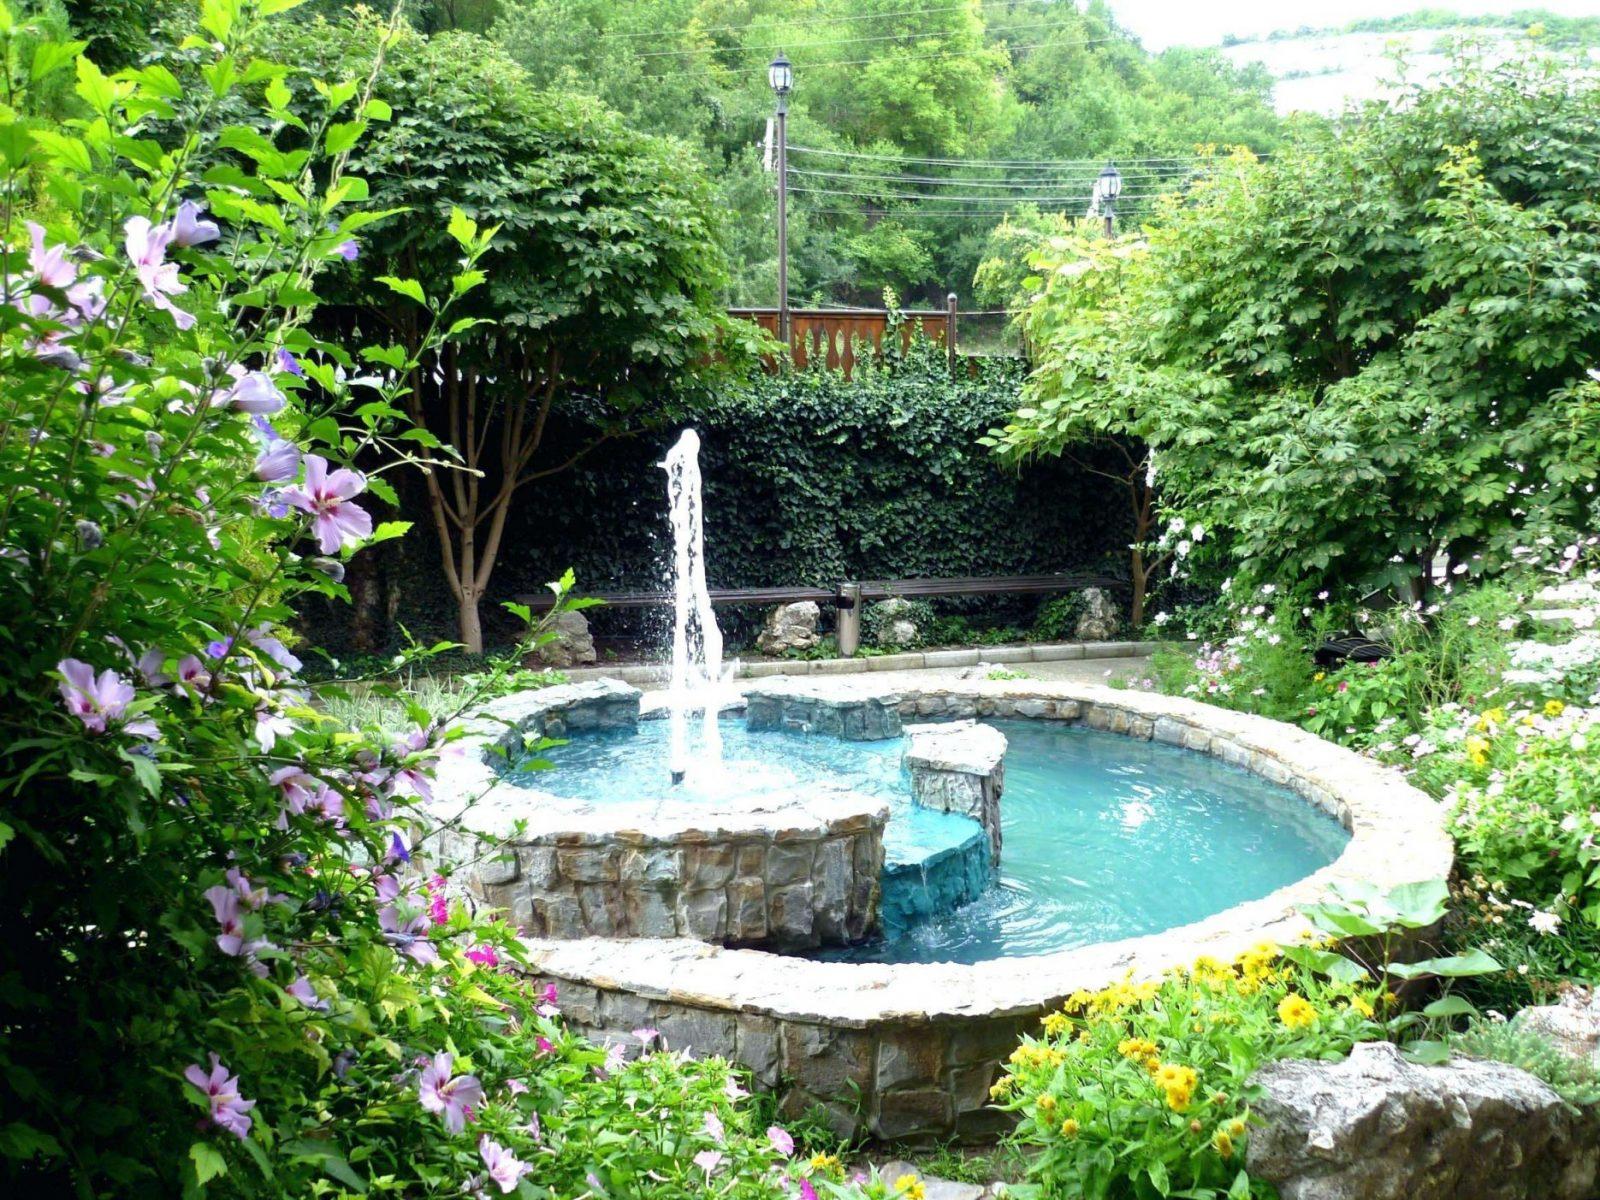 42 Inspirierend Wasserfall Gartenbrunnen Pic  Komplette Ideen von Garten Springbrunnen Selber Bauen Photo